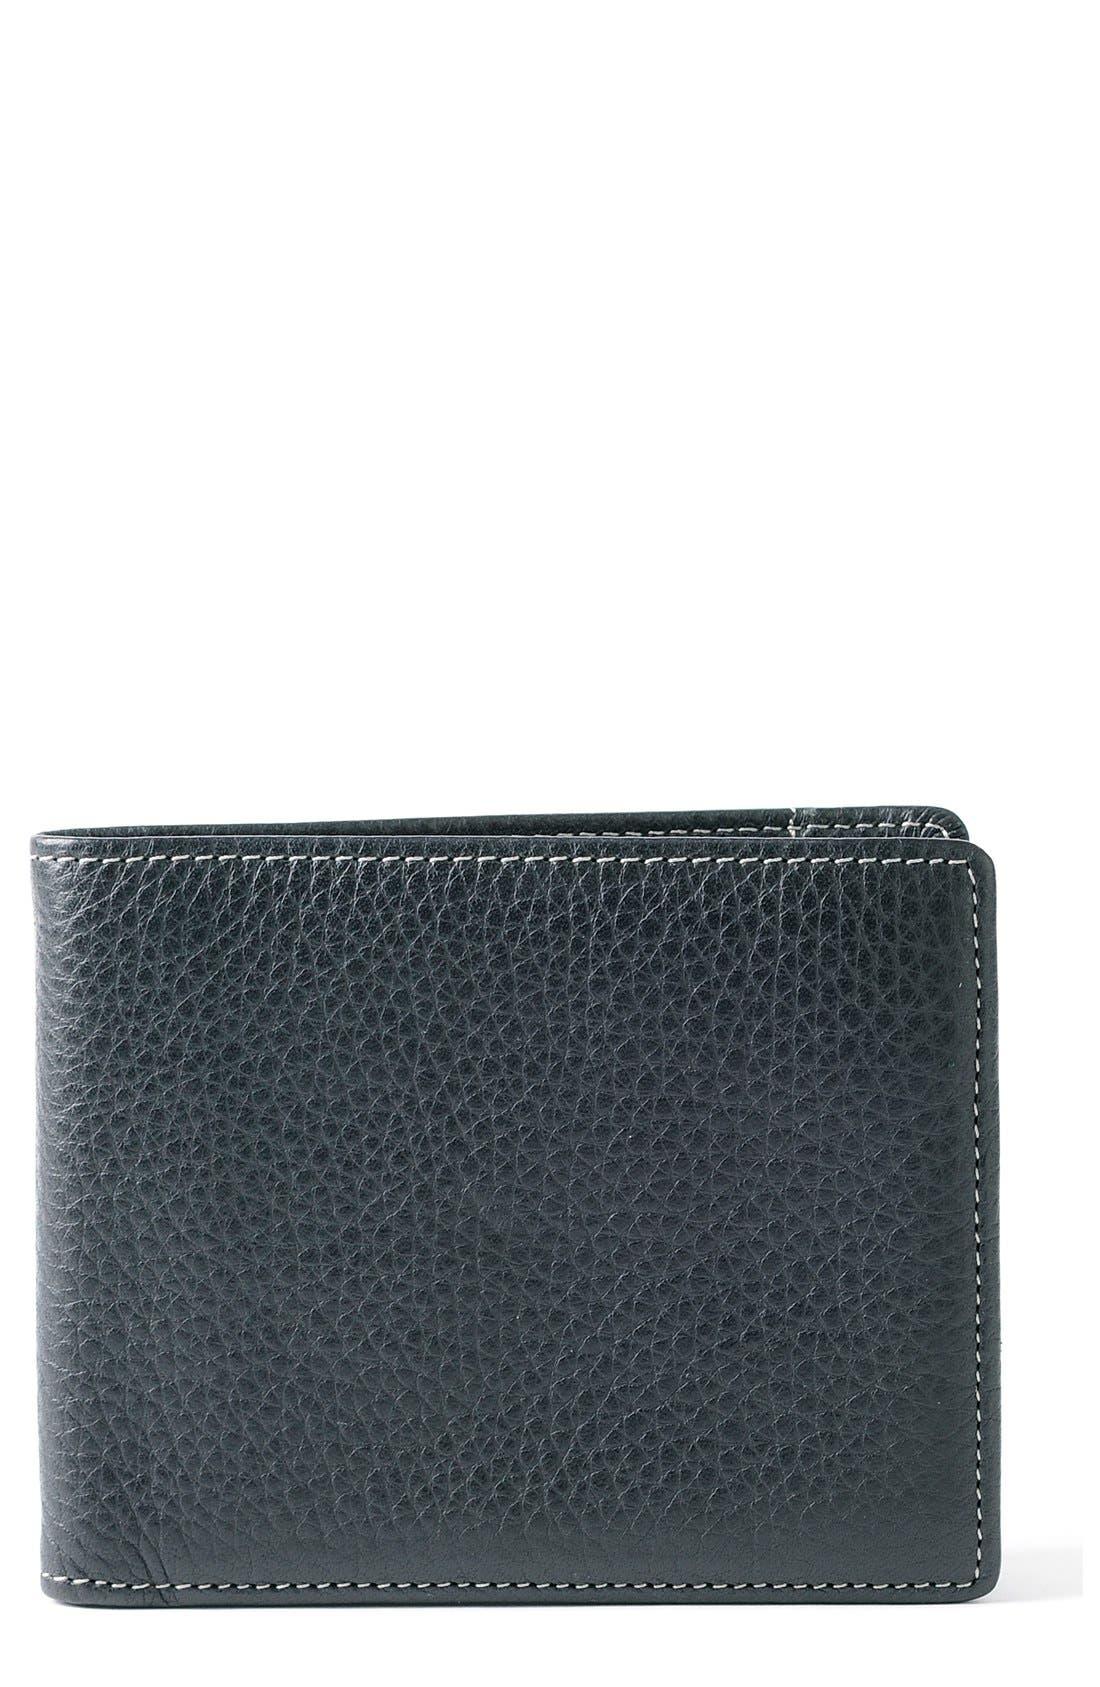 Main Image - Boconi 'Tyler' RFID Wallet